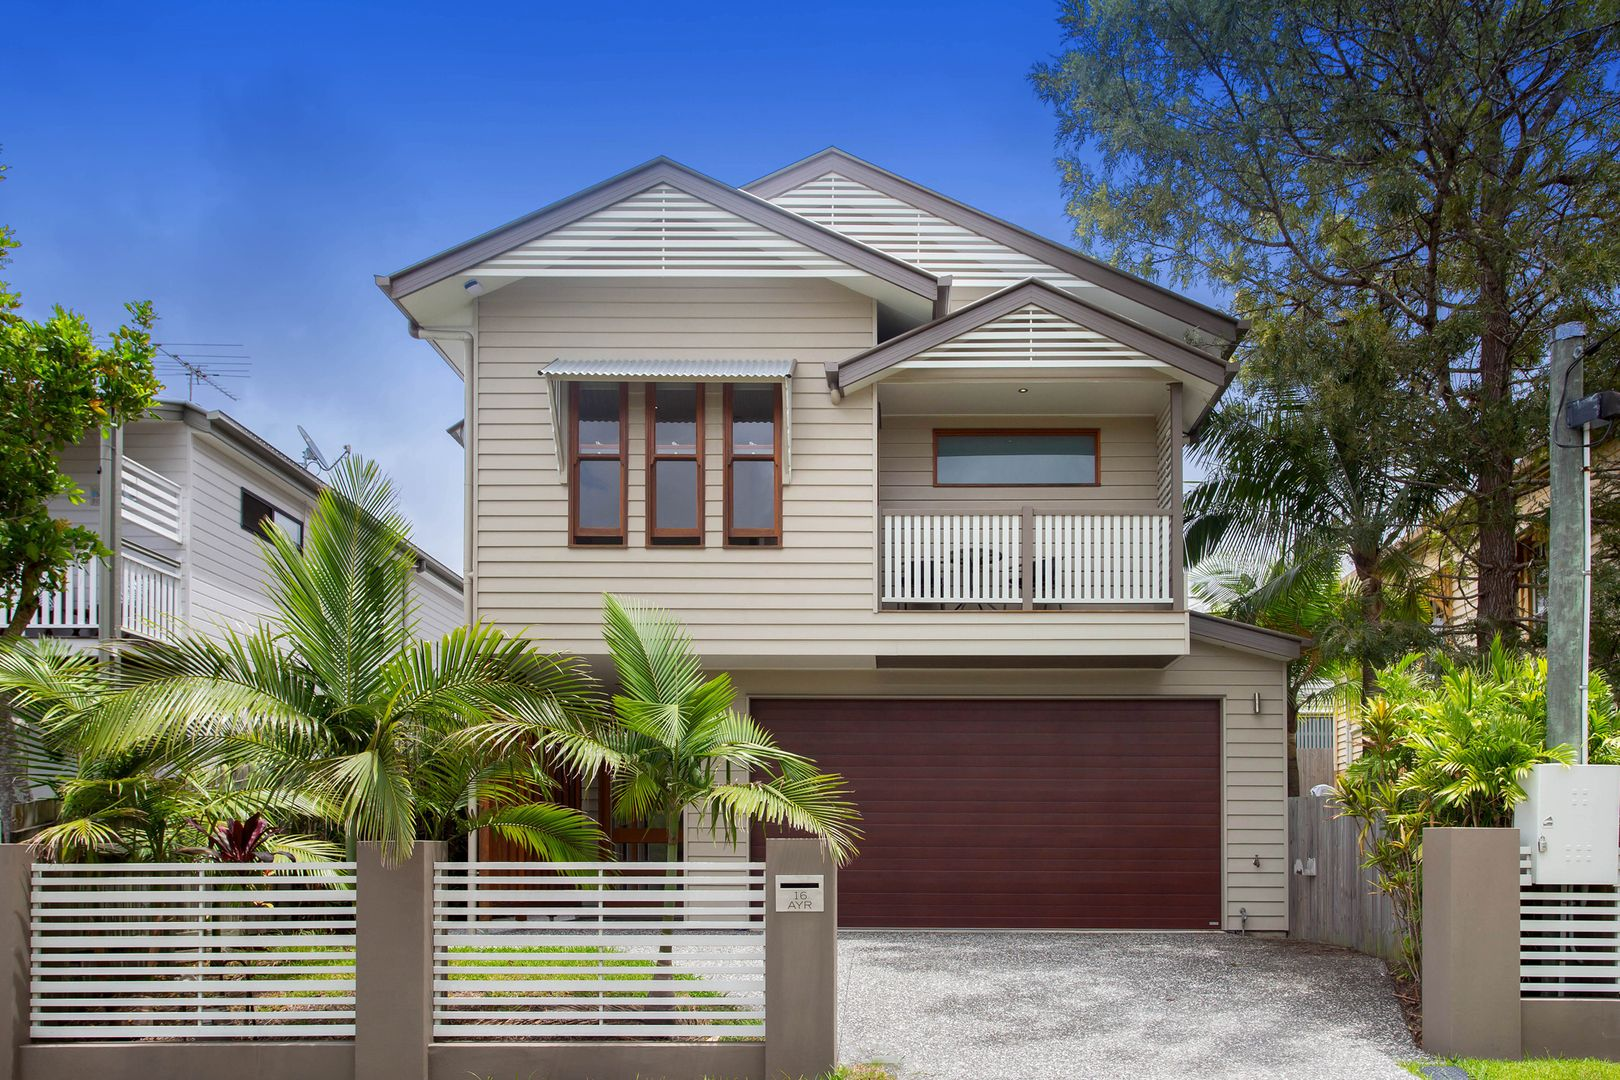 16 Ayr Street, Morningside QLD 4170, Image 0